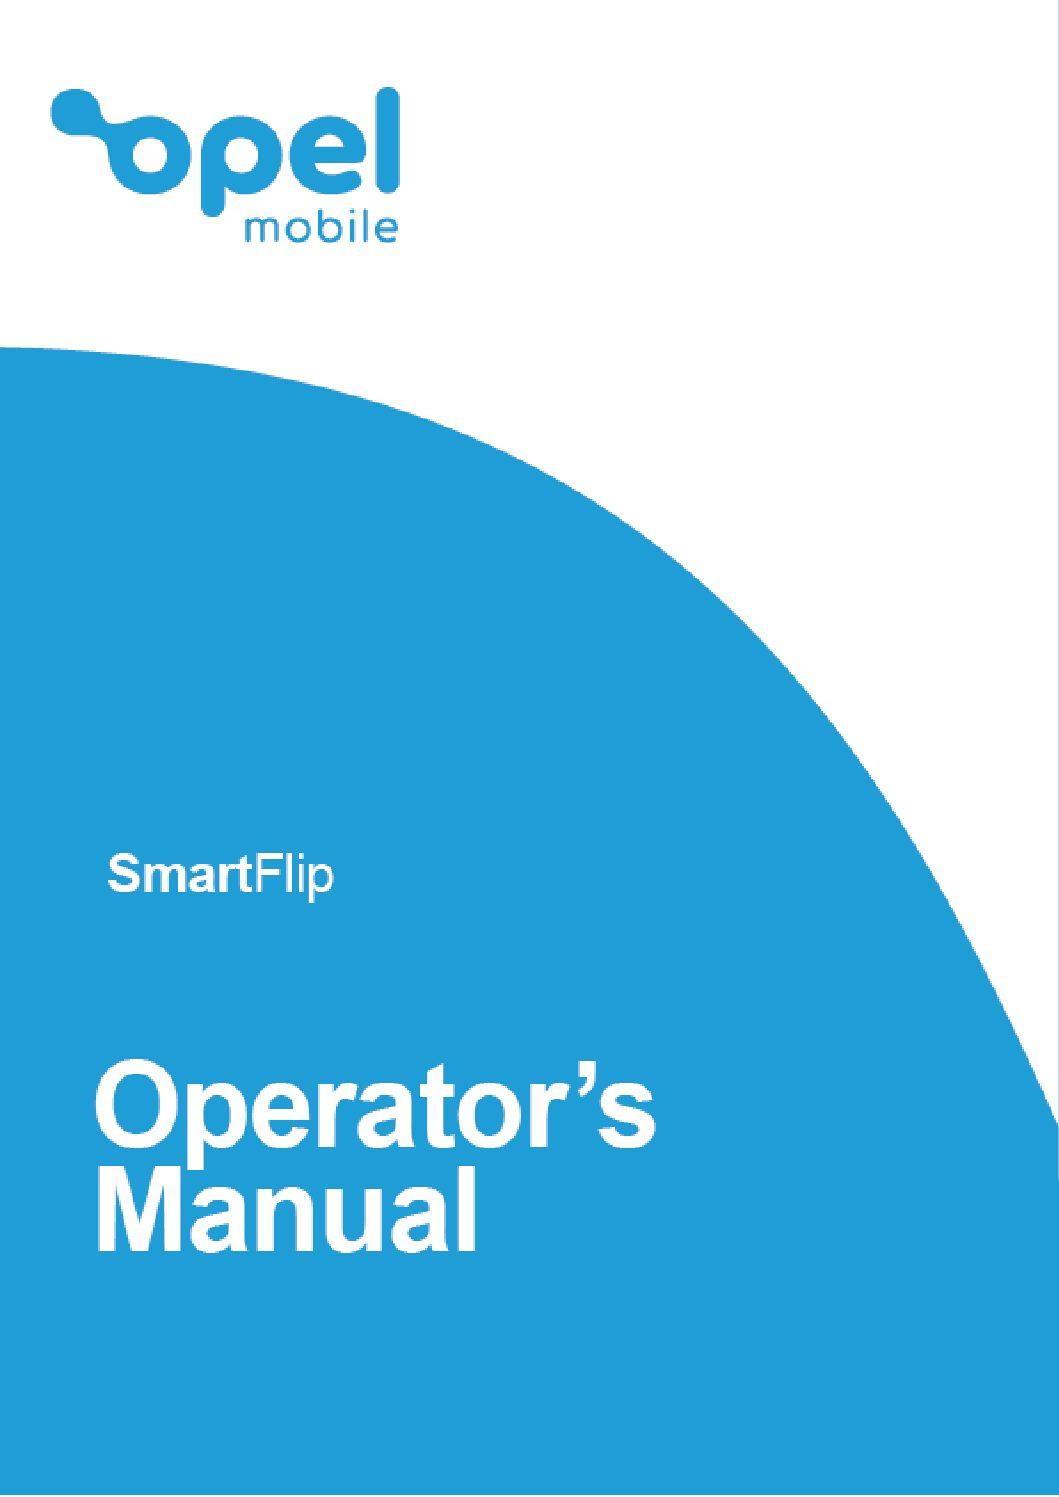 Smart Flip Operator's Manual V4